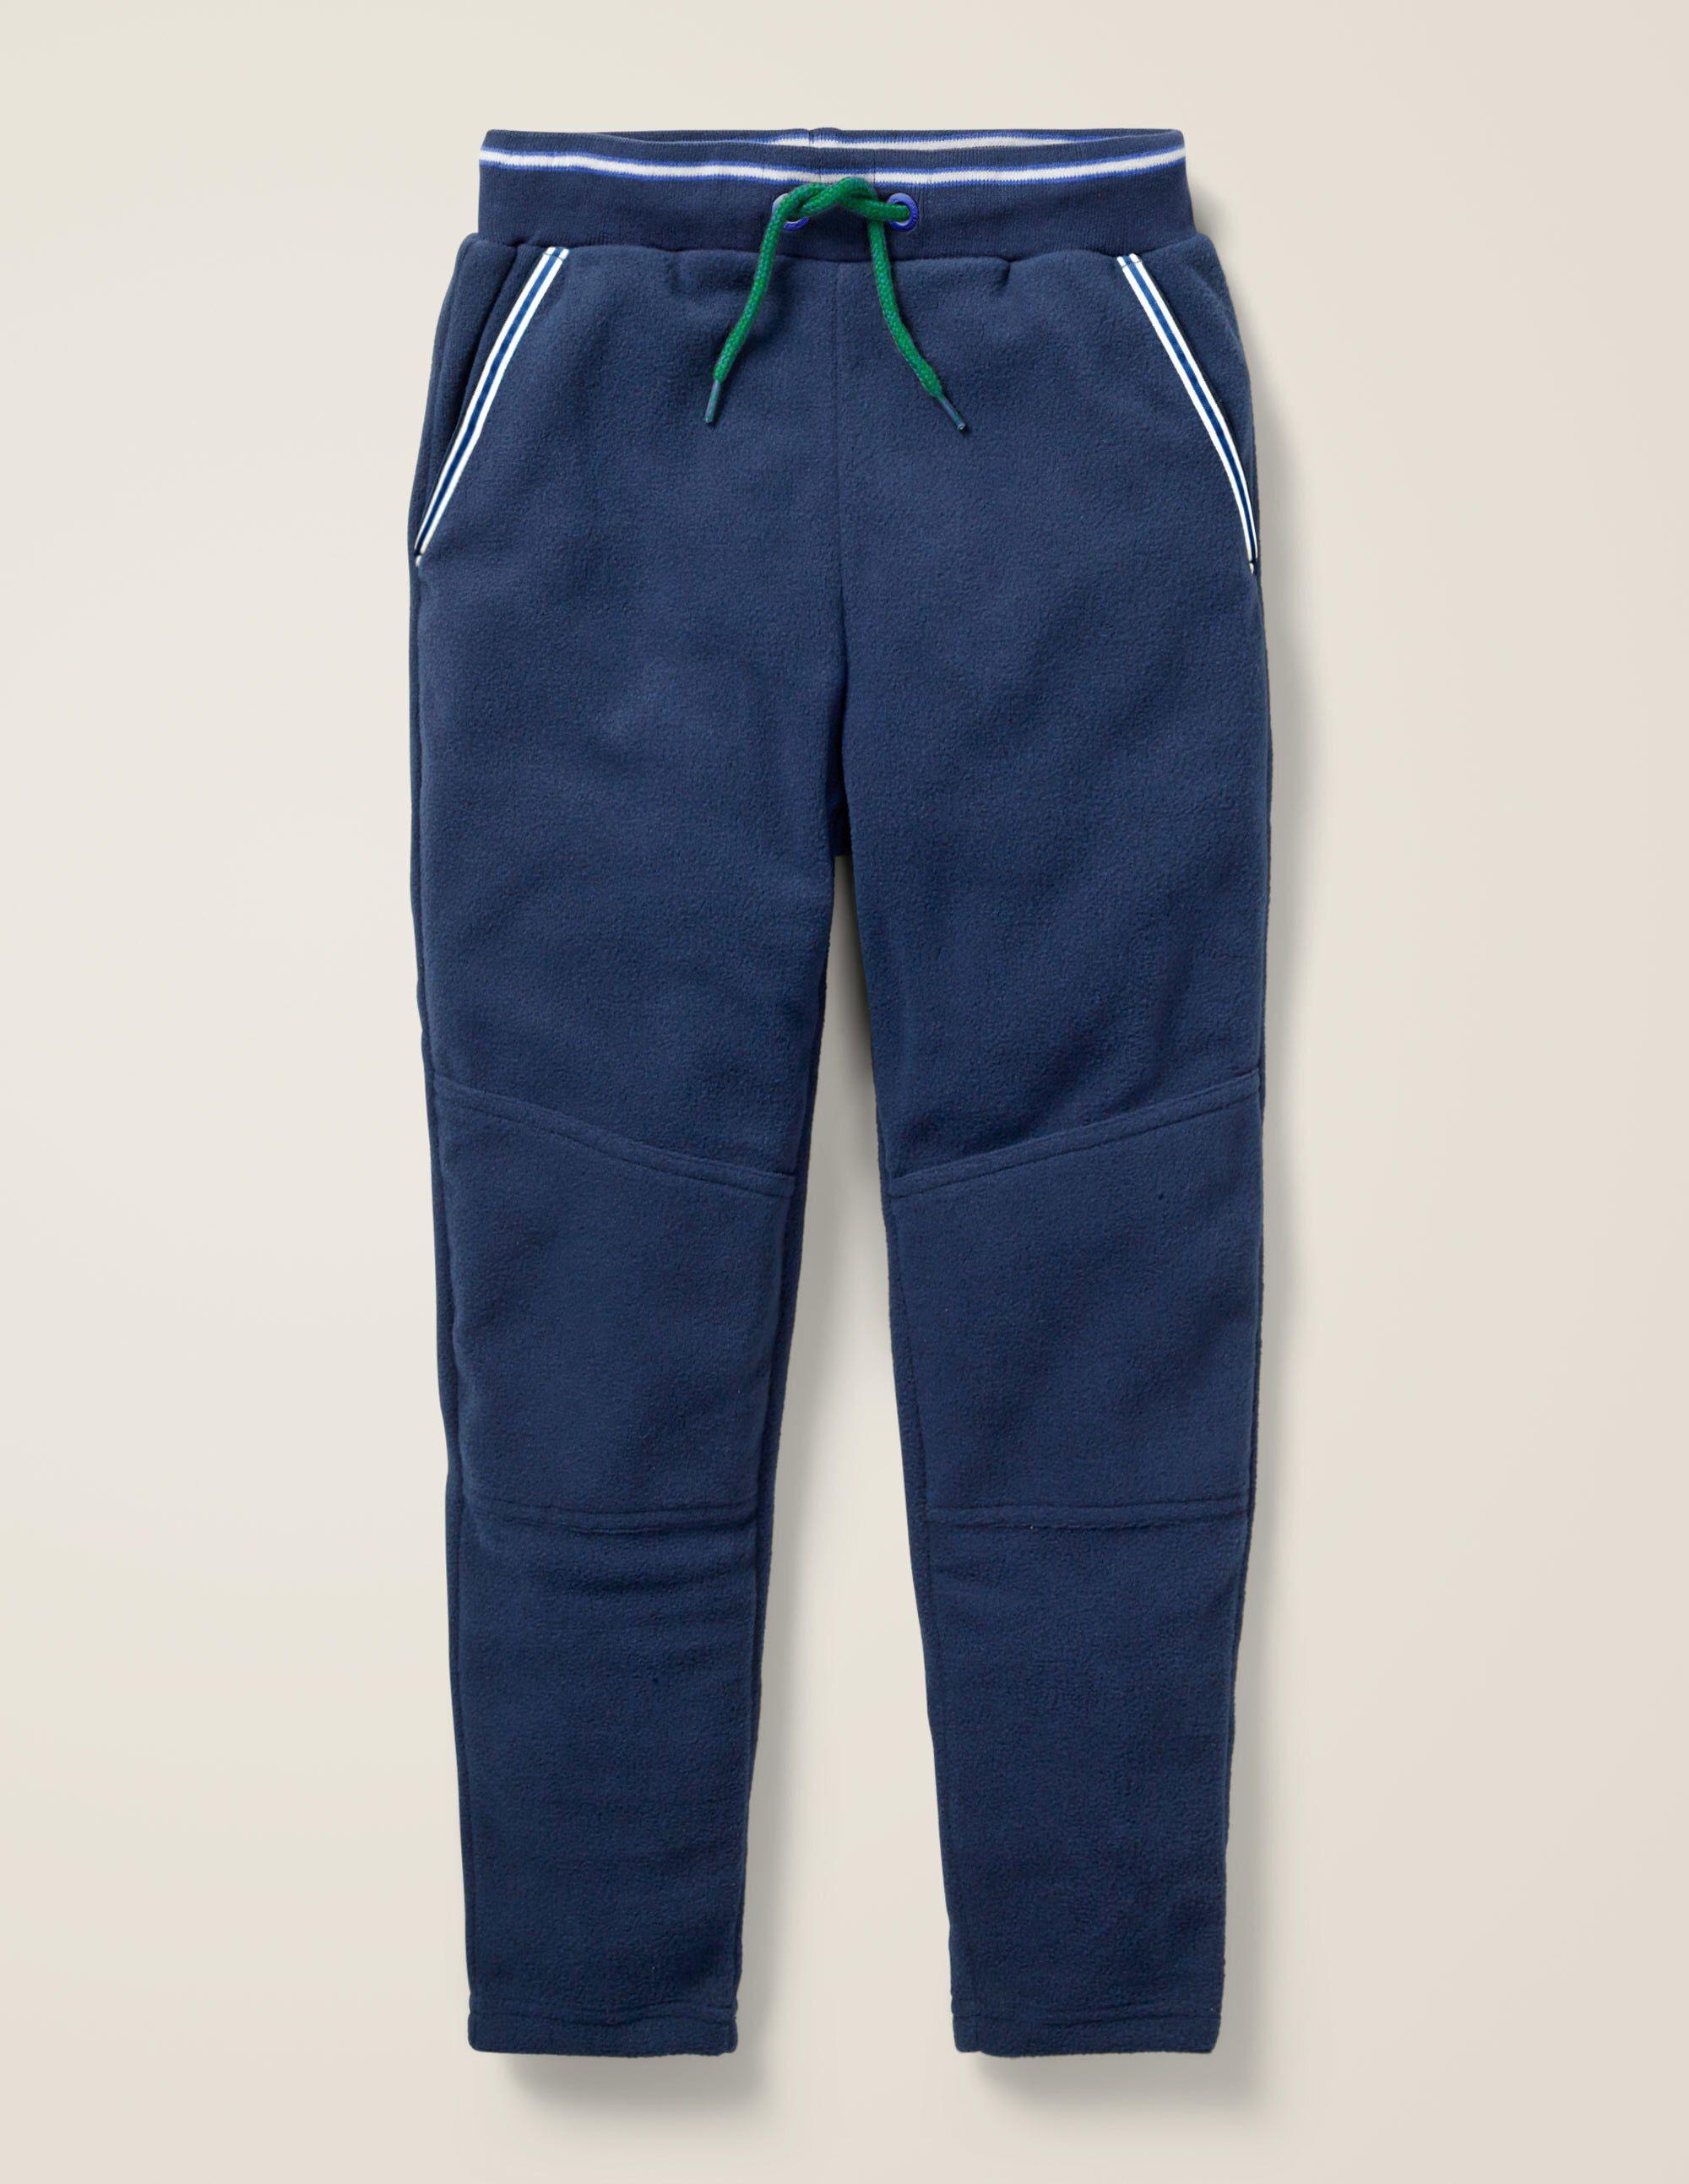 Mini Pantalon de survêtement en micro-polaire BLU Garçon Boden, Blue - 5a